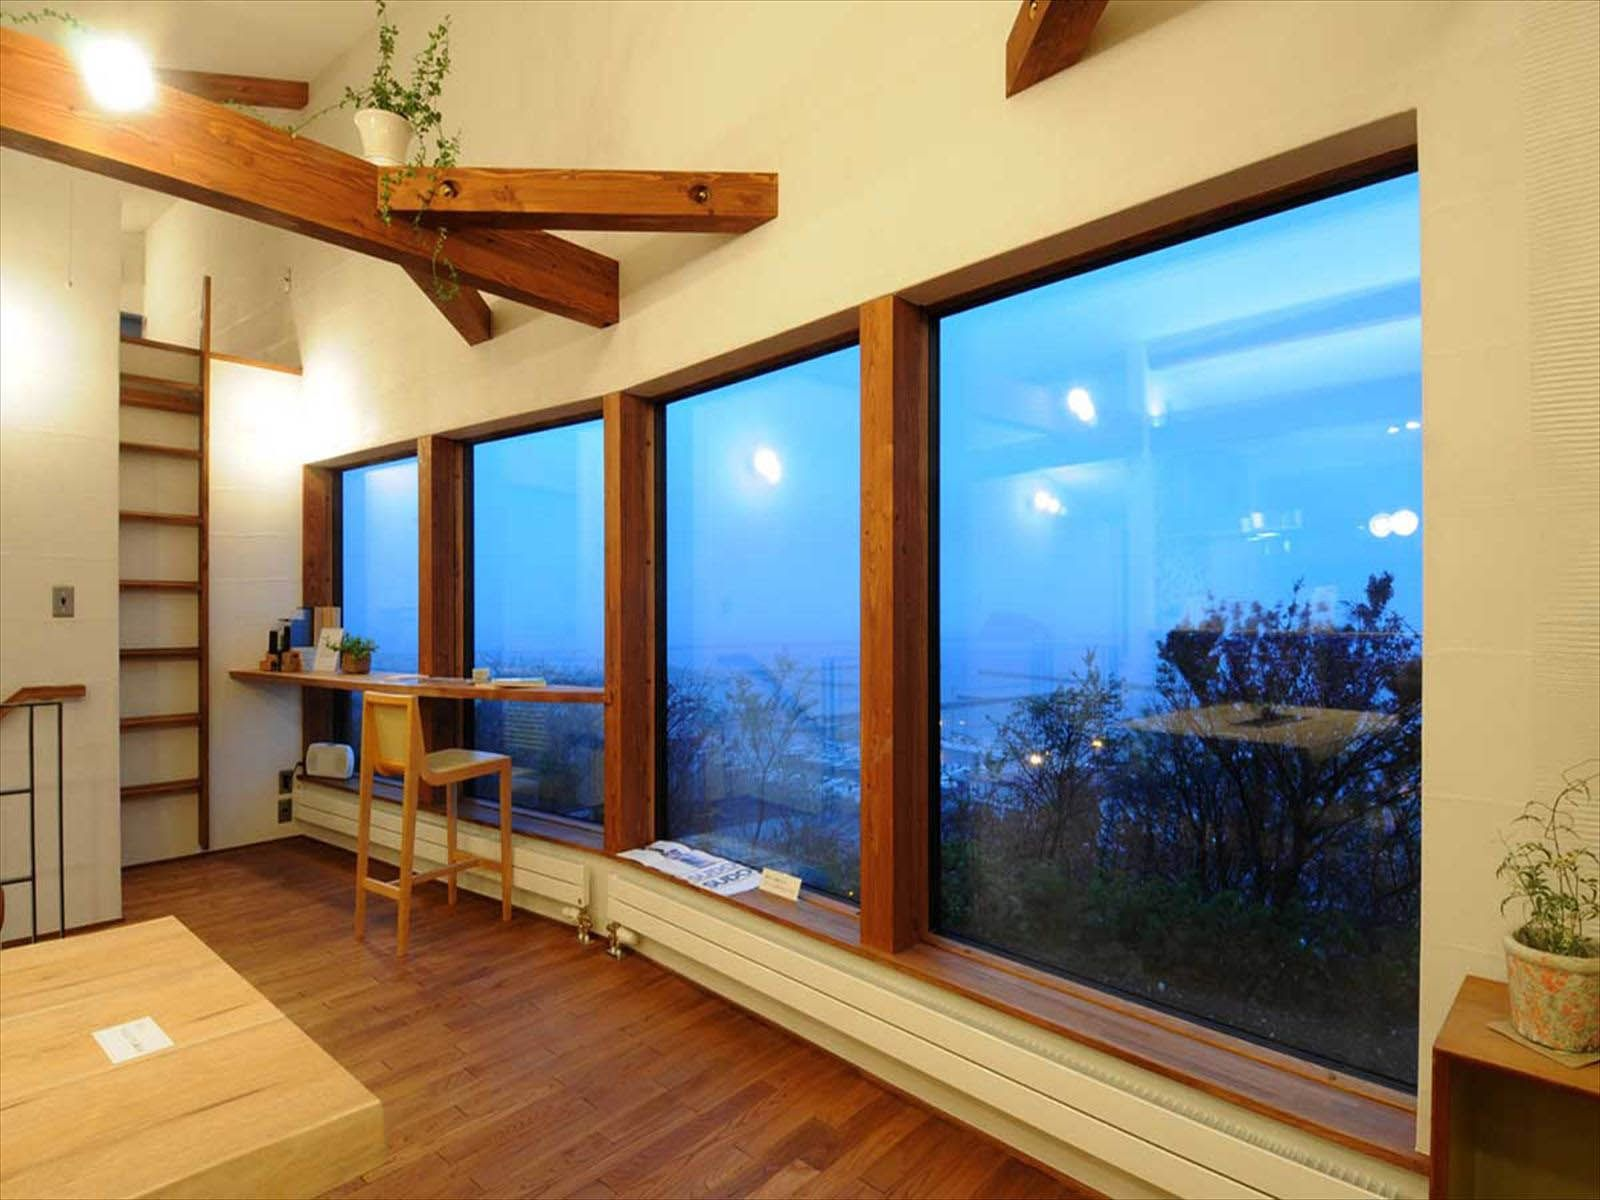 Japanese Distributor Visit Windows Windows And Doors West Coast